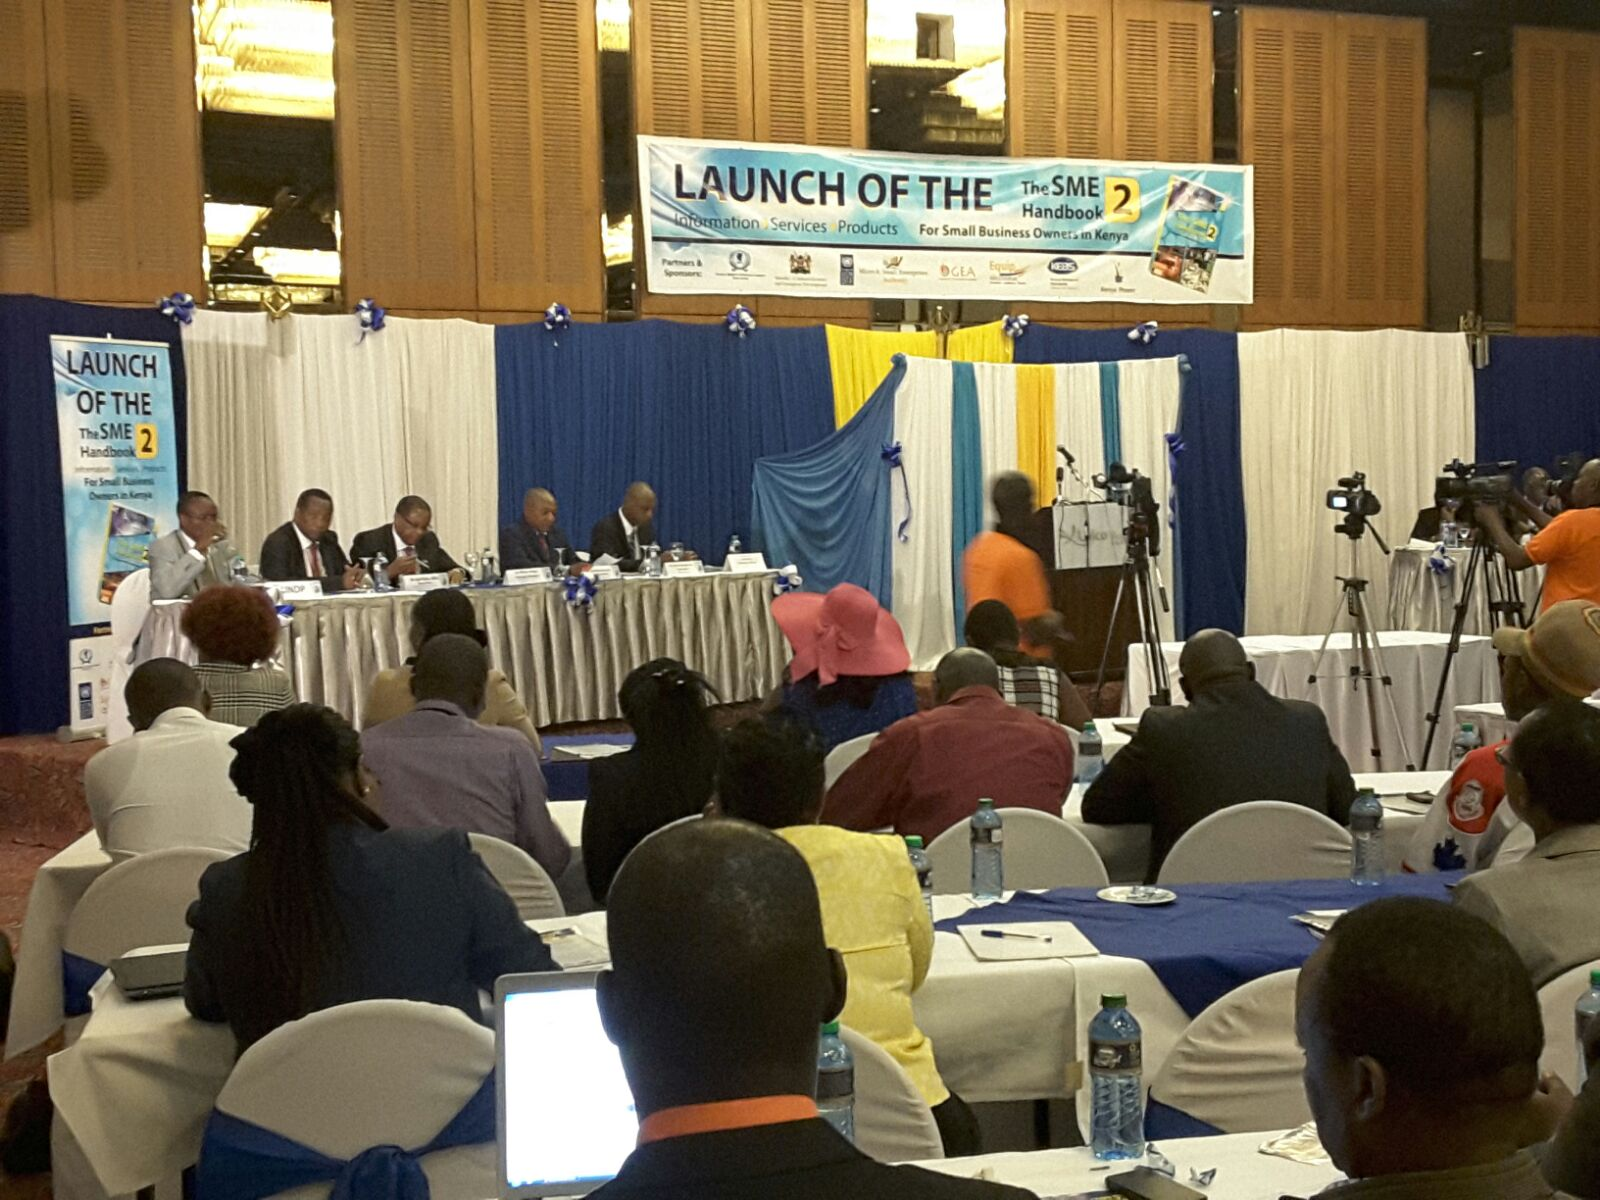 SME Handbook Launch